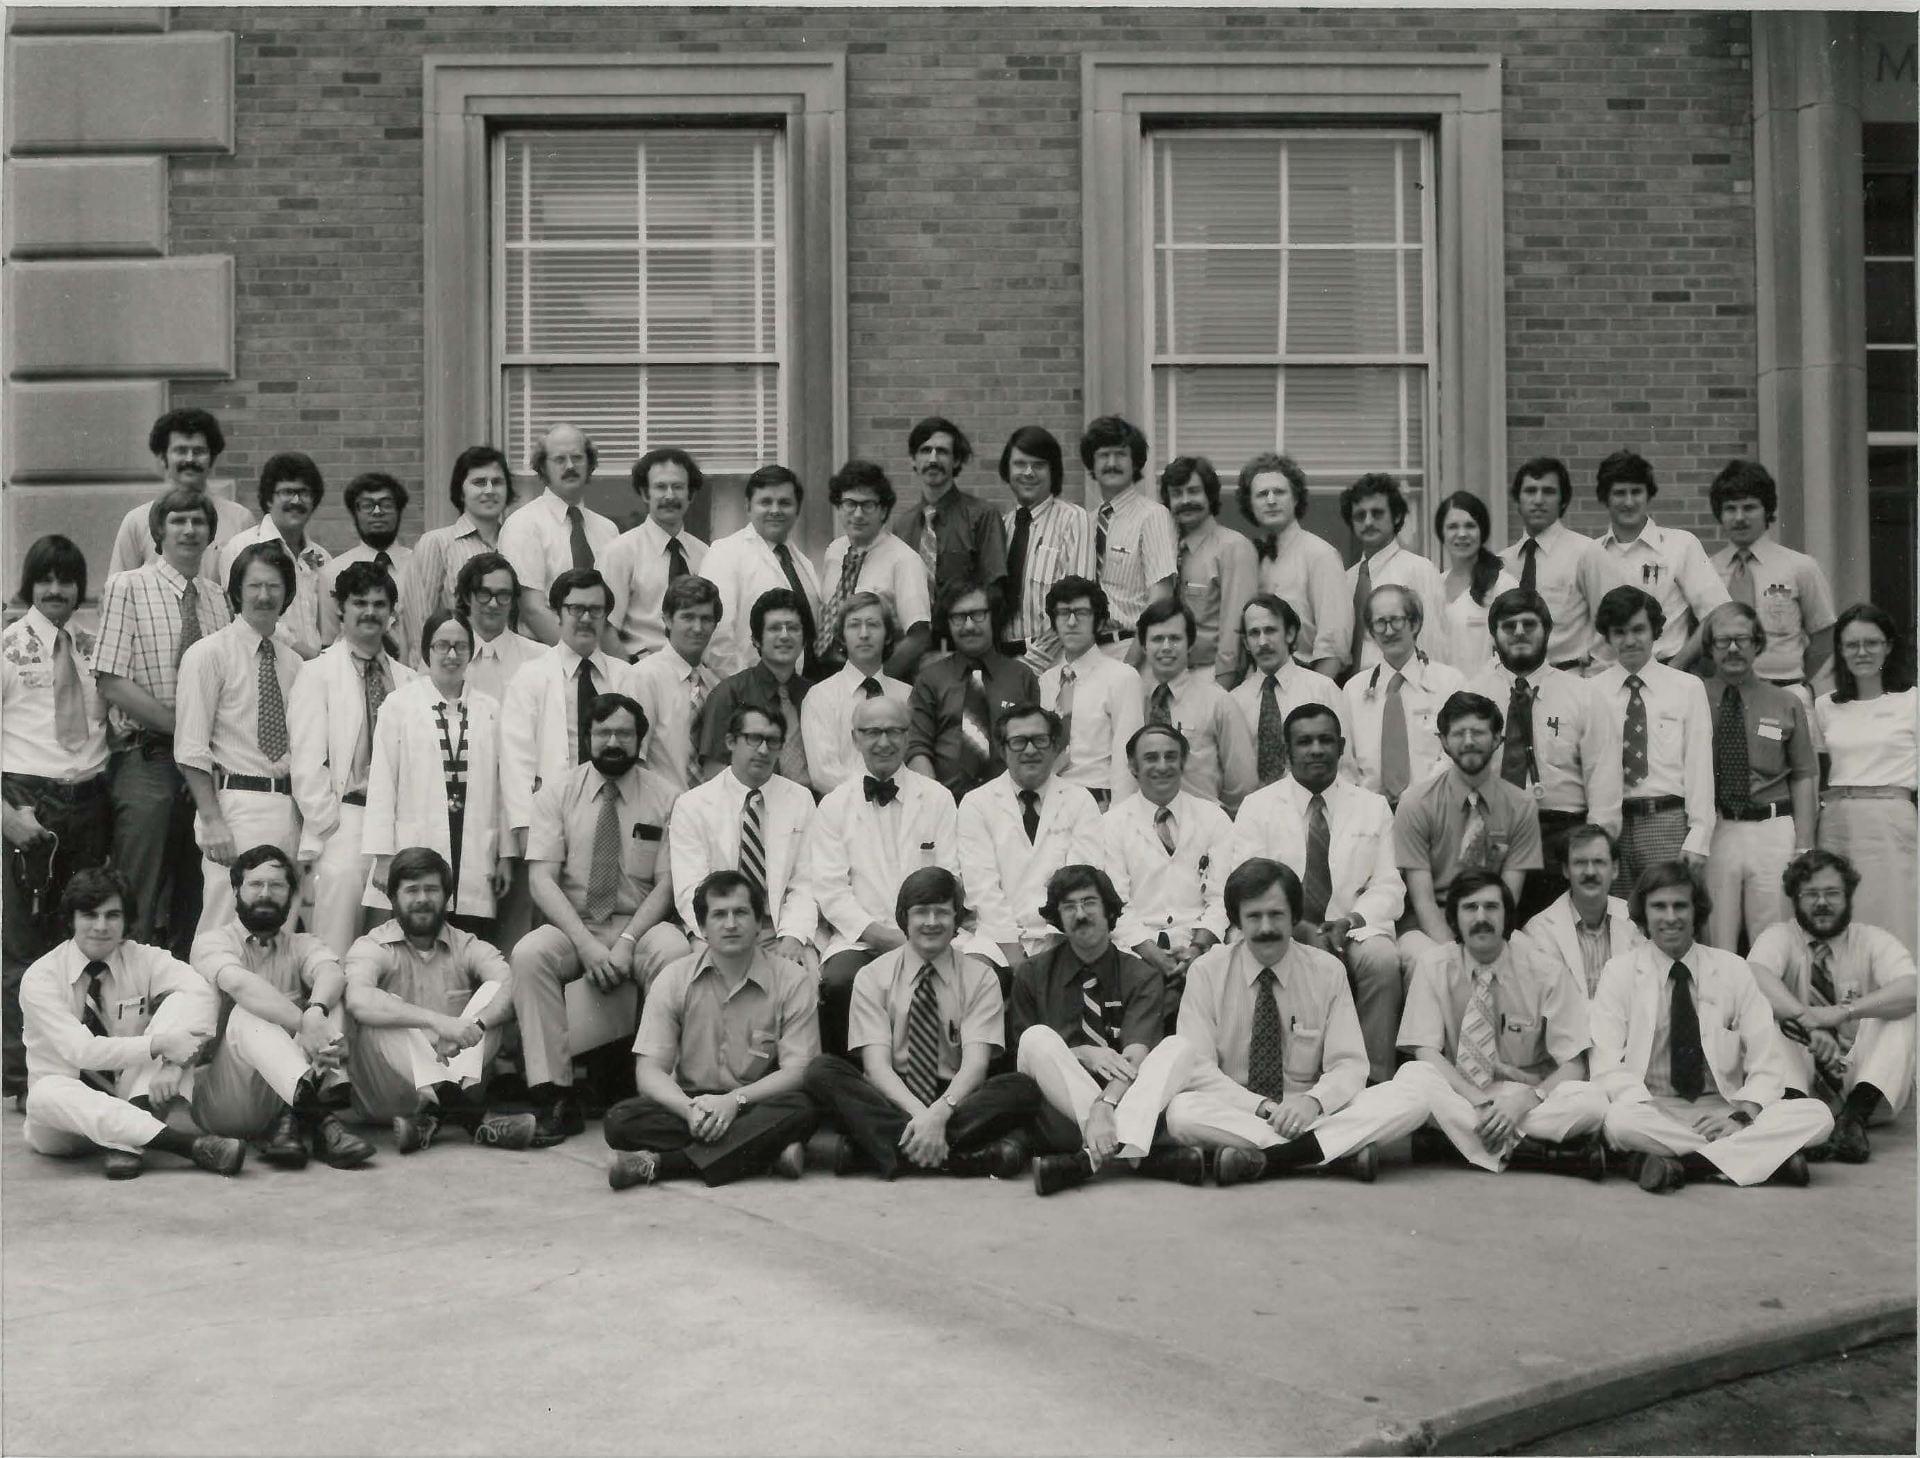 1975 Housestaff Photo